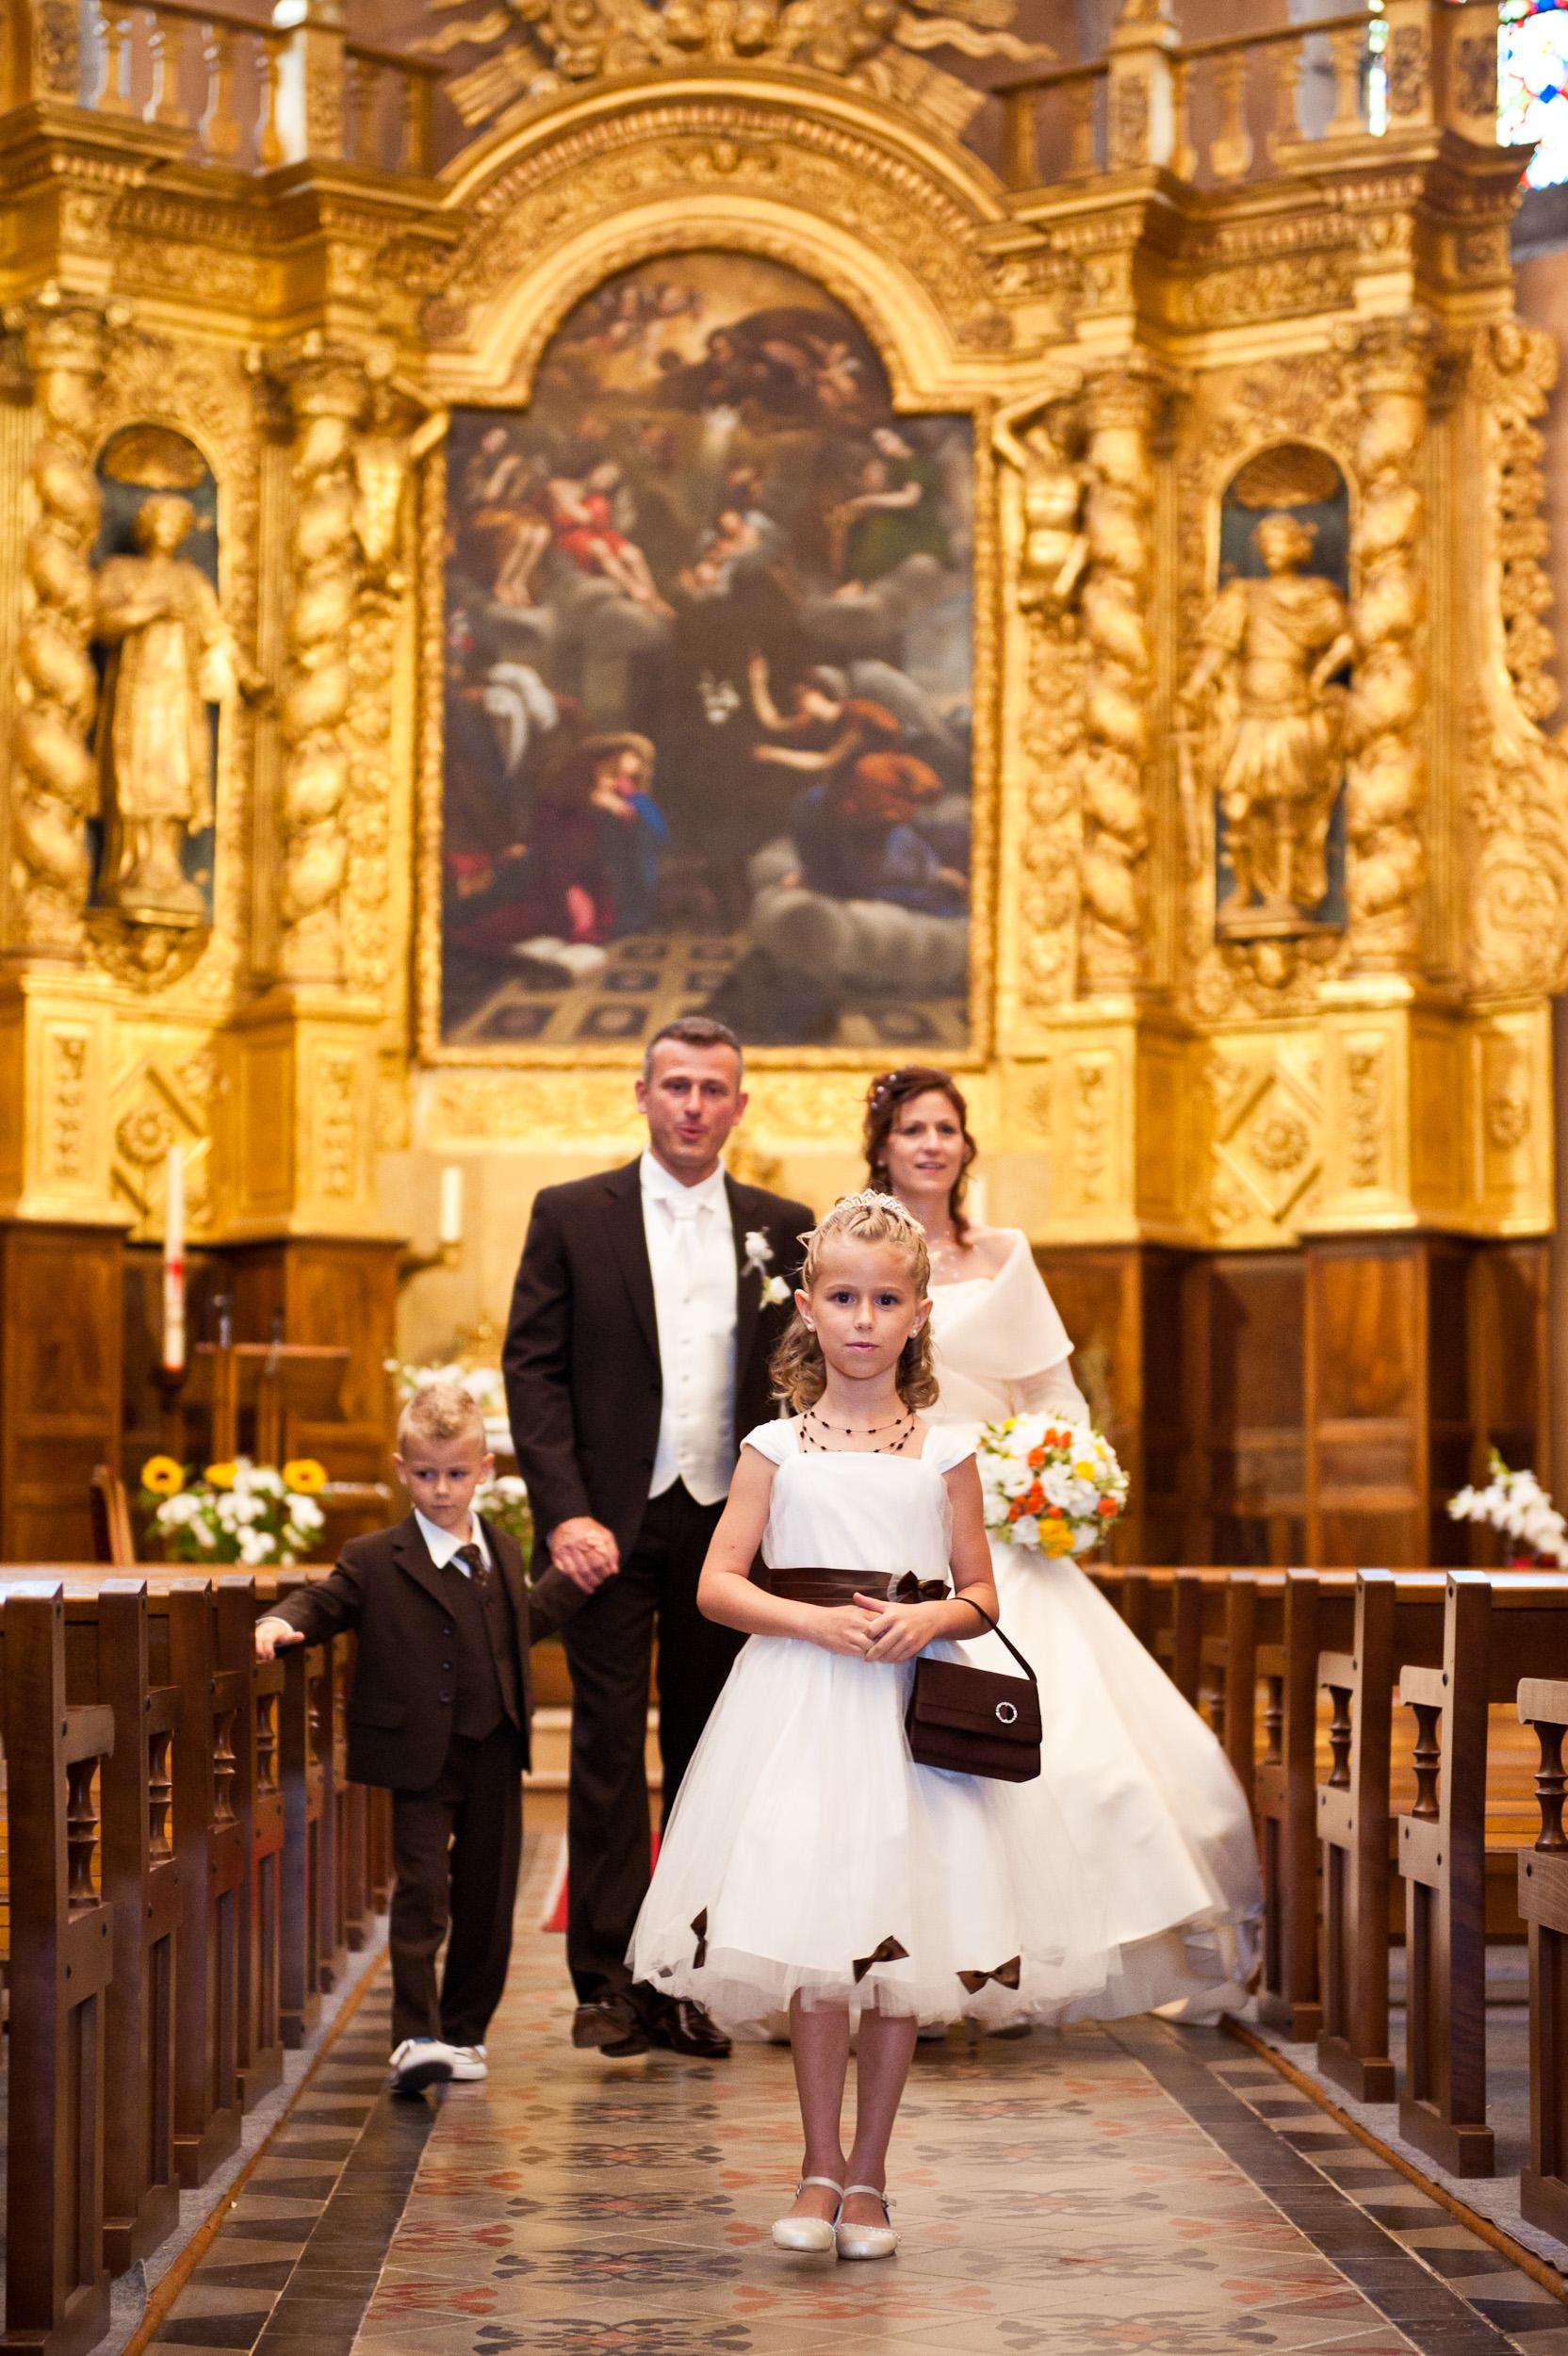 Photographe mariage Nice / 06 - wedding photographer